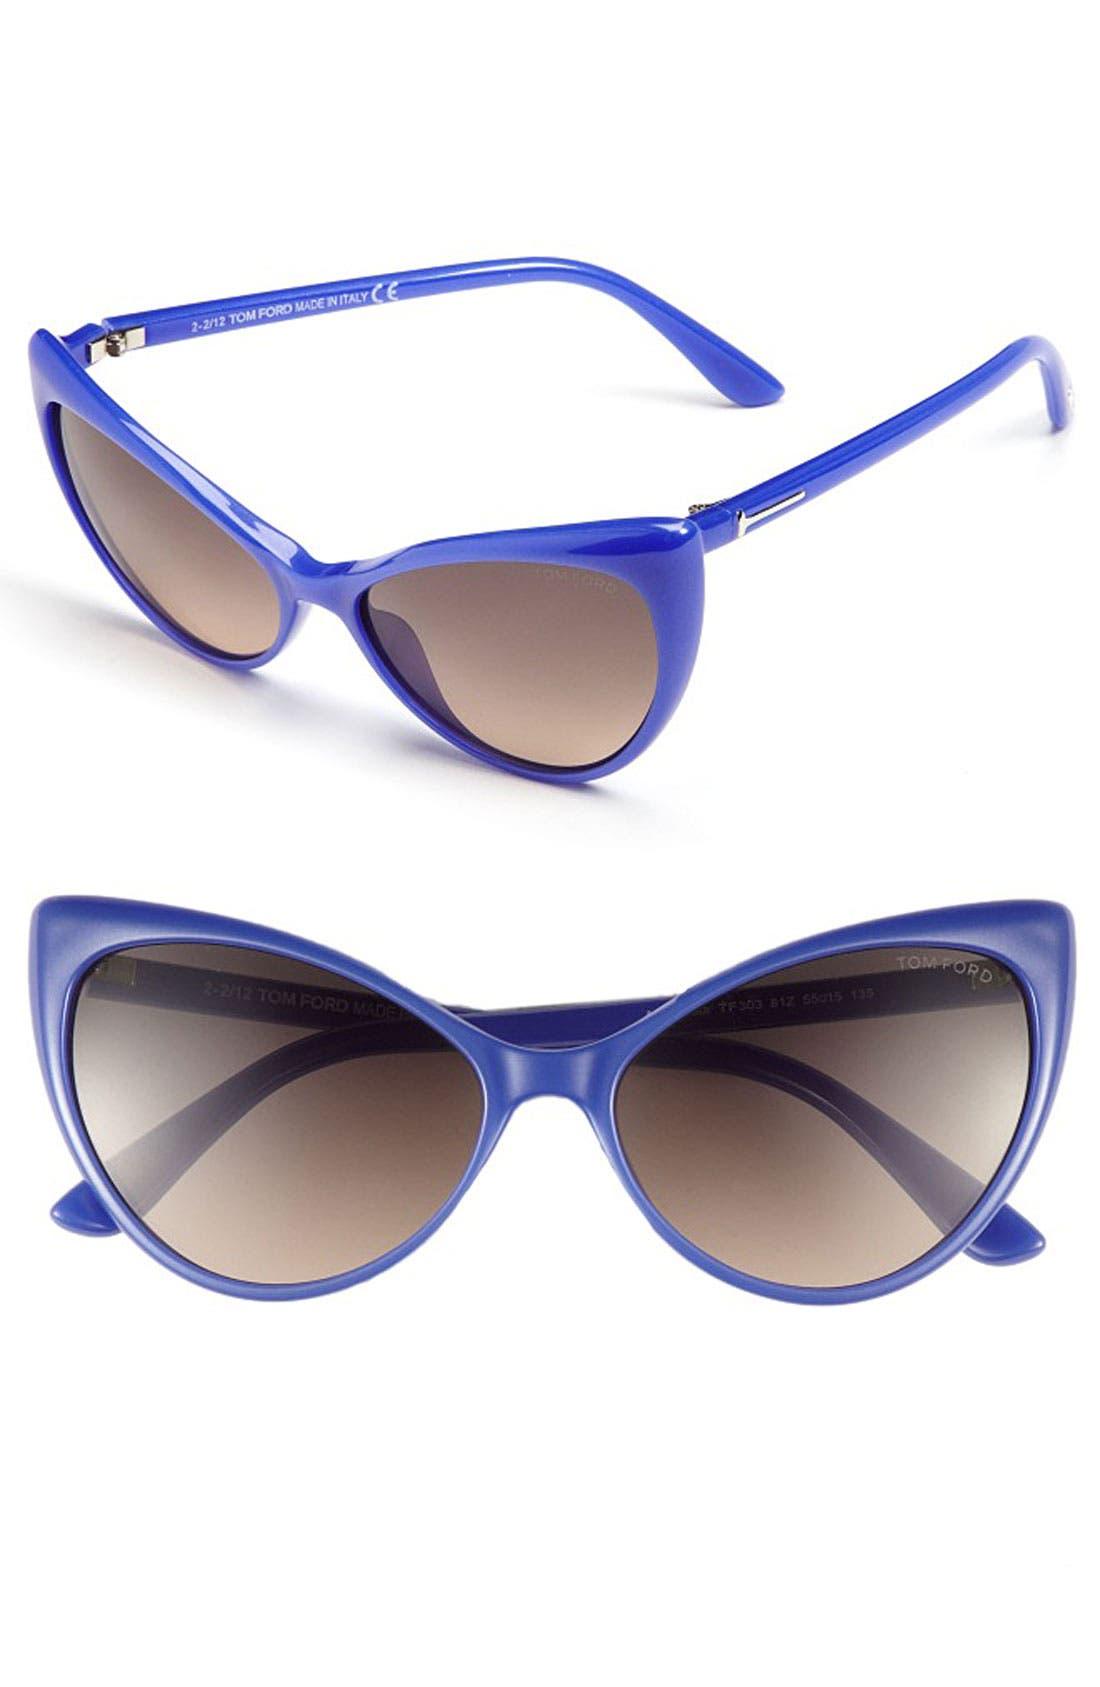 Main Image - Tom Ford 'Anastasia' 55mm Retro Sunglasses